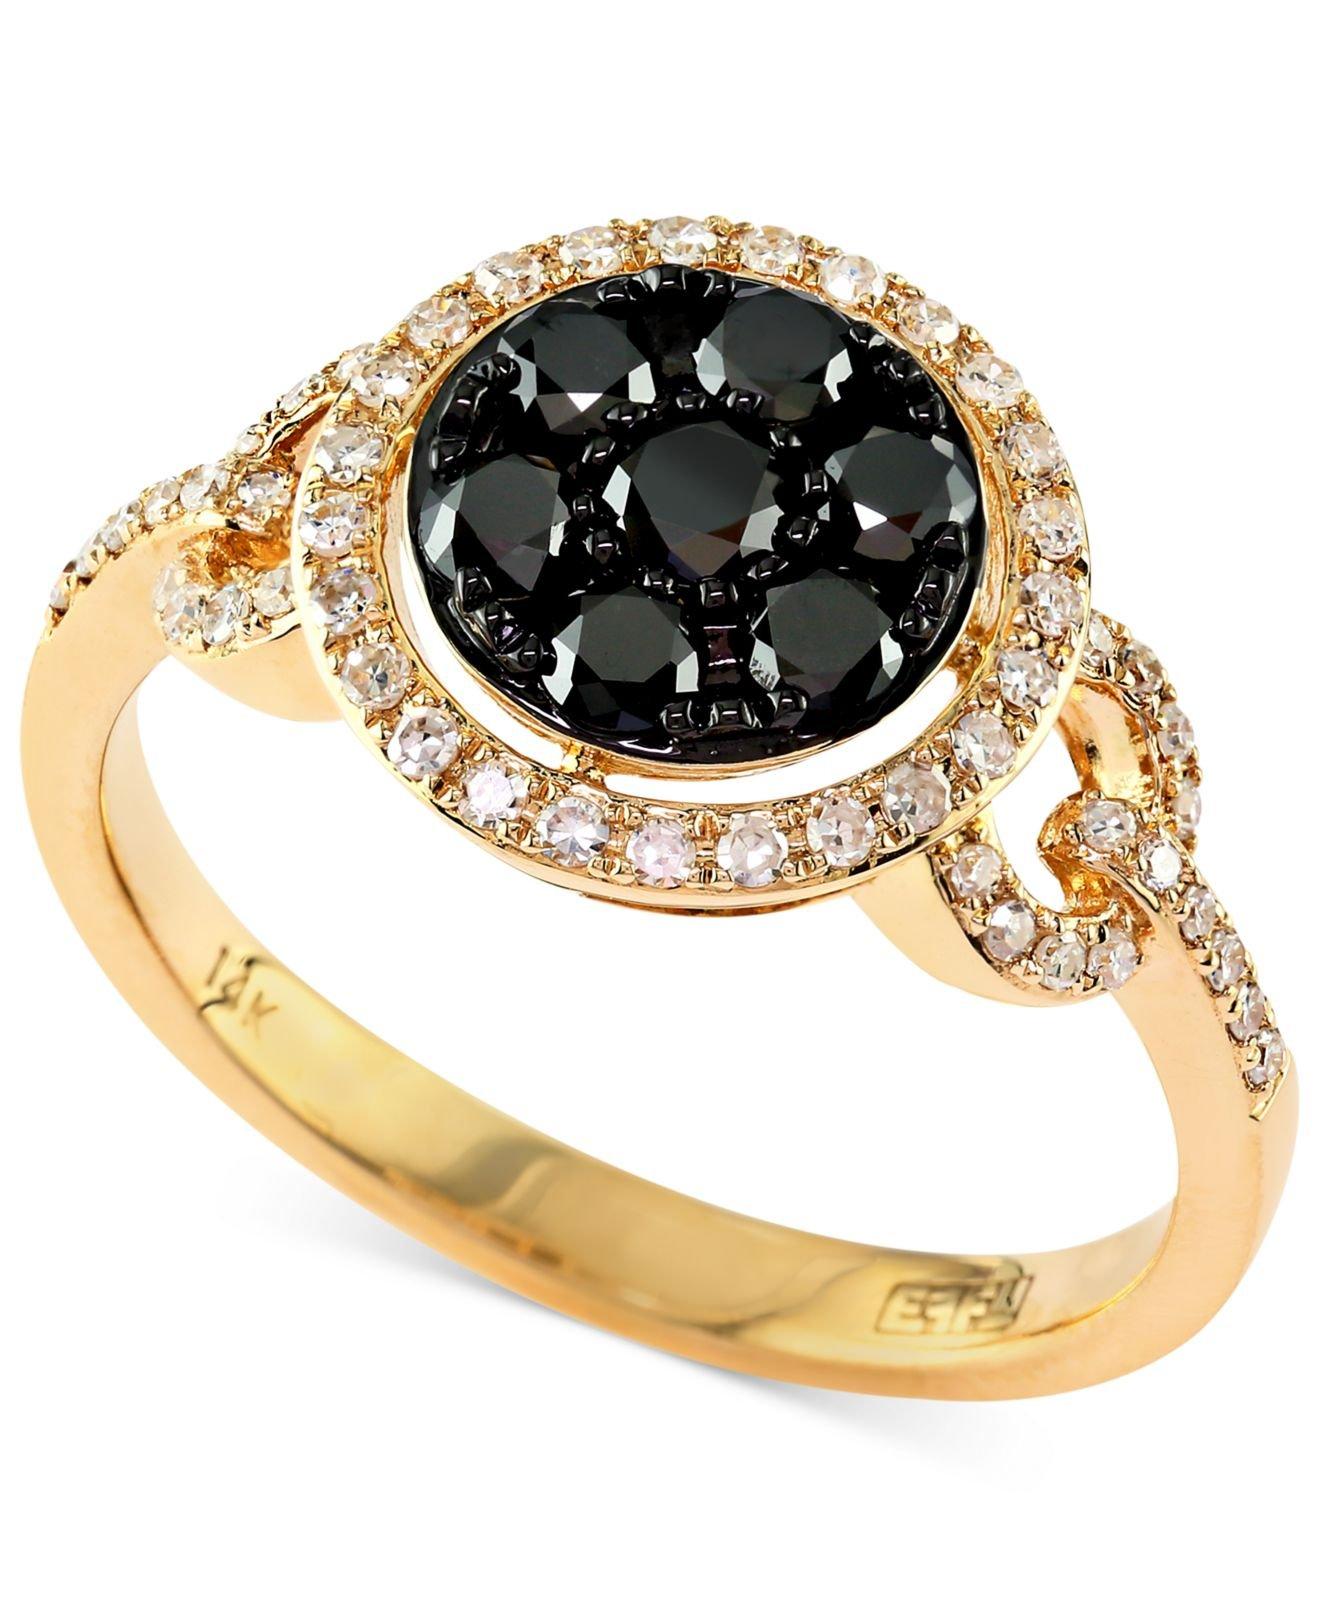 Effy Collection Caviar By Effy Black And White Diamond